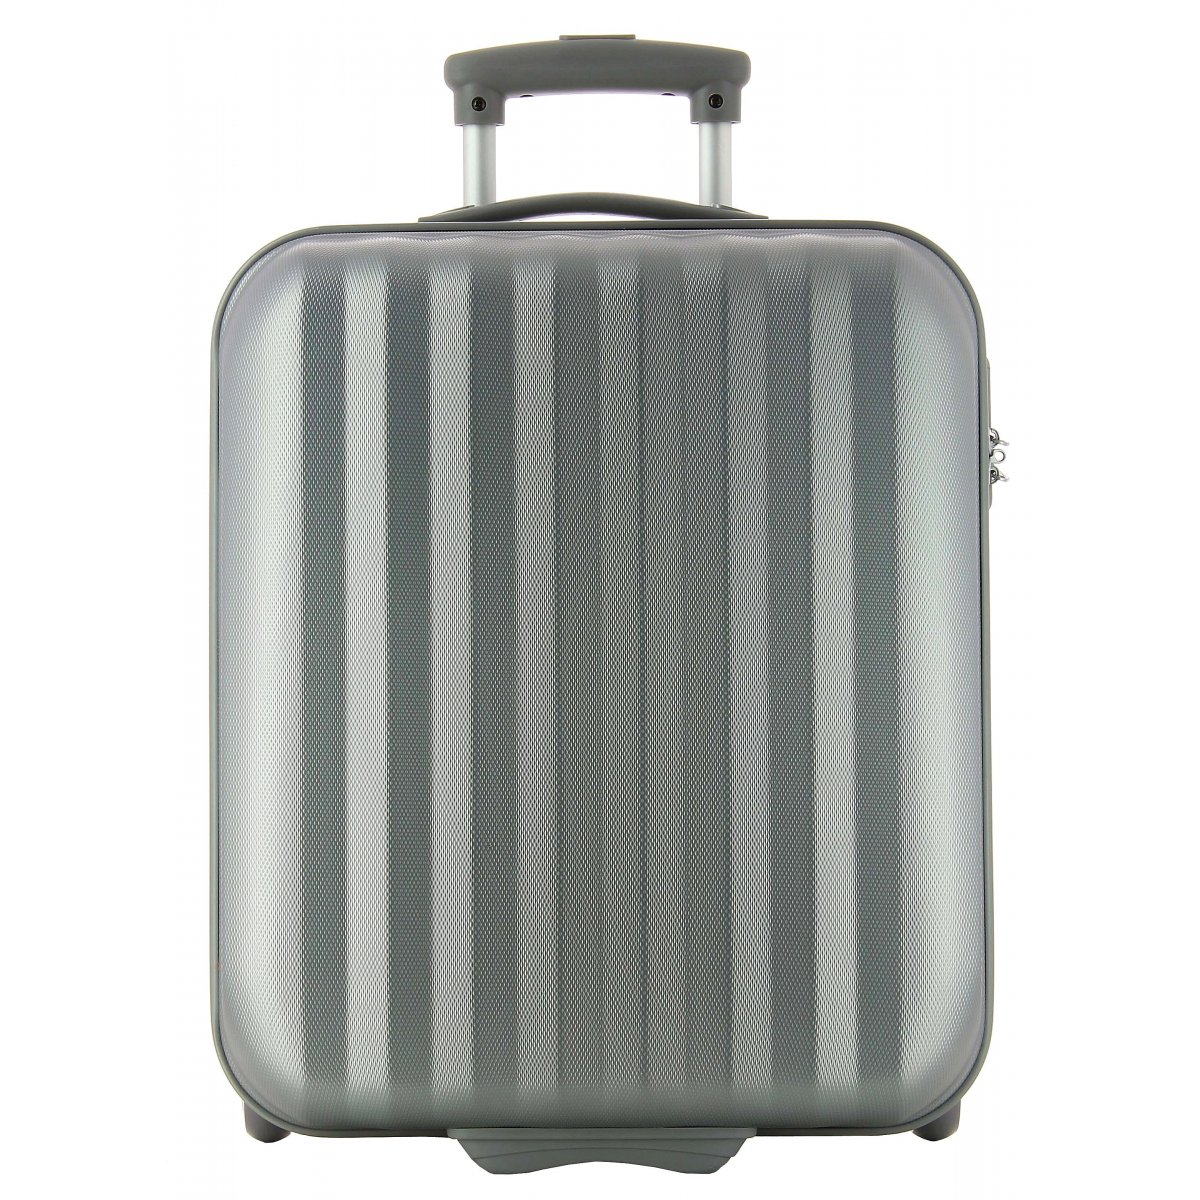 Valise cabine ryanair david jones 50 40cm ba10051 - Valise a prix discount ...